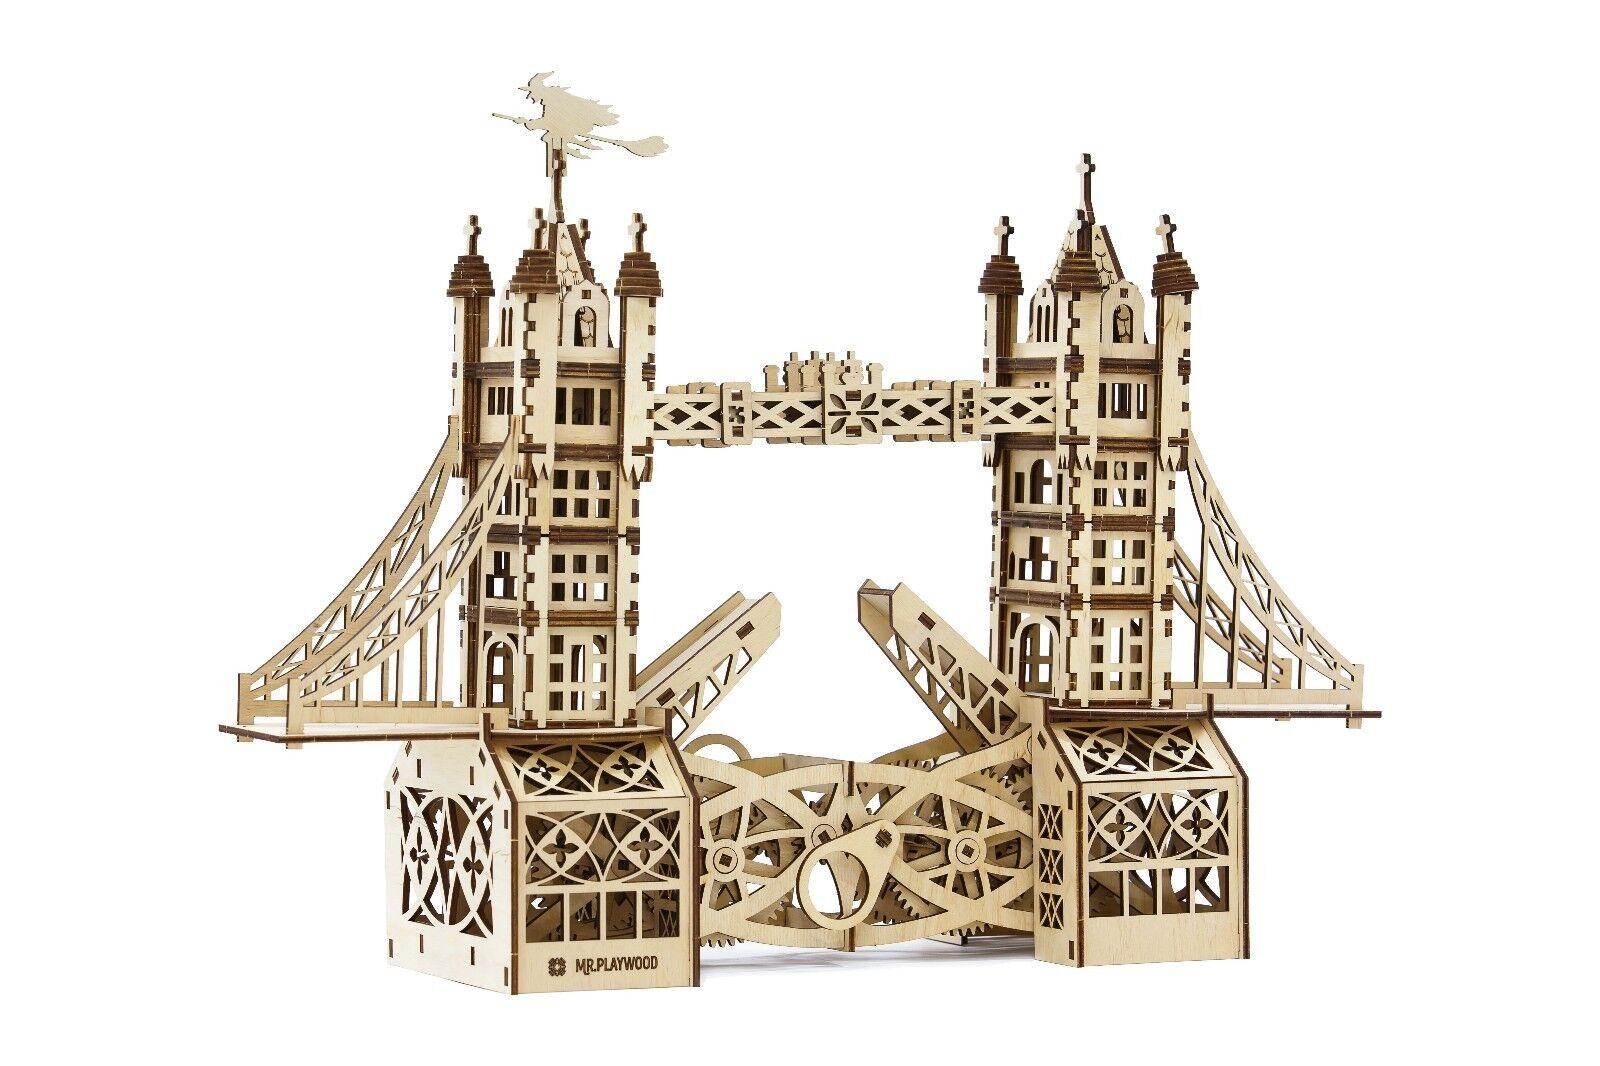 TOWER BRIDGE - MrPLAYWOOD - 3D Mechanical Wooden Model & Puzzle